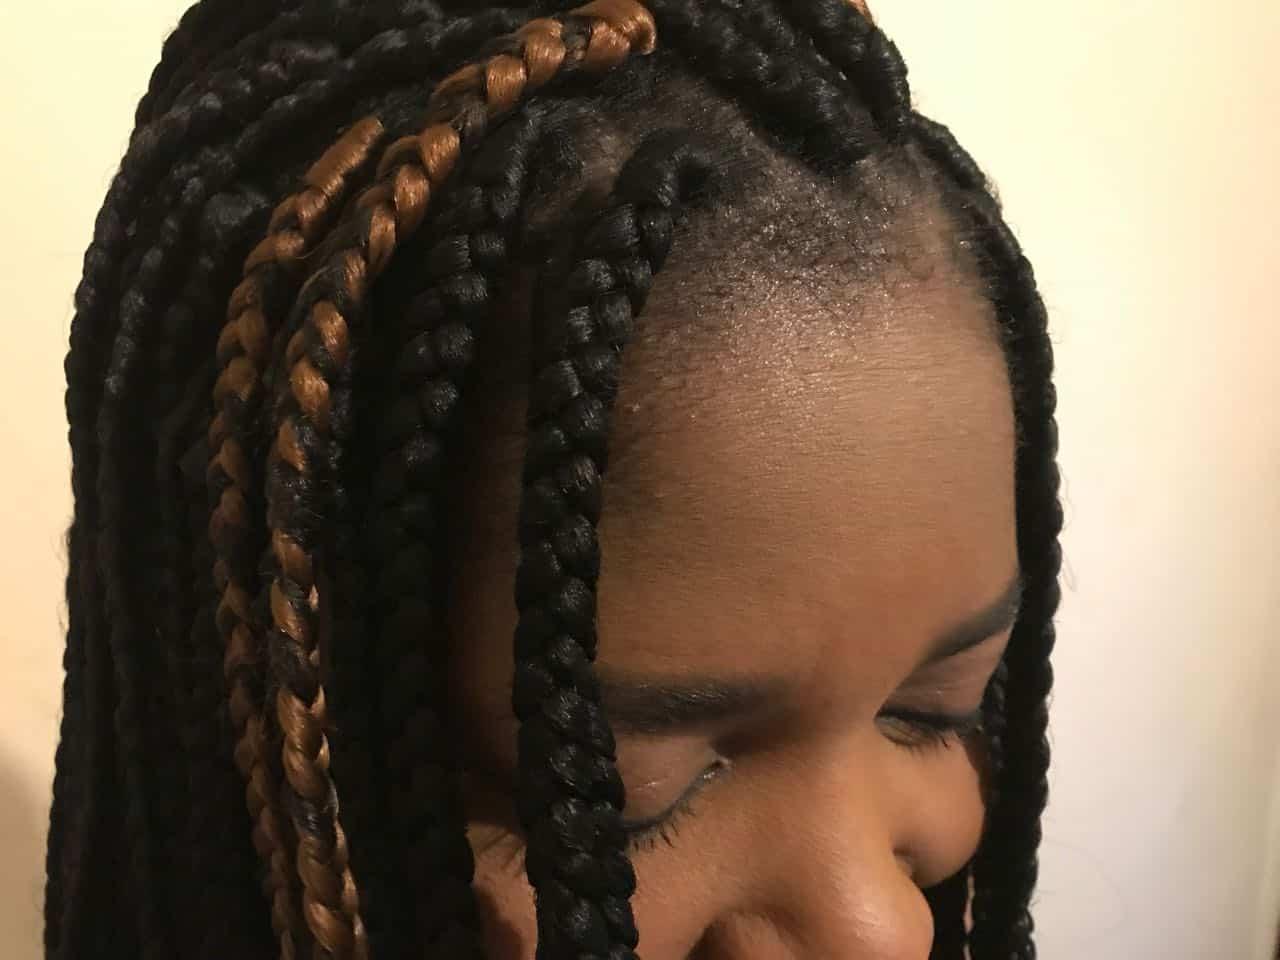 hair loss, Hair Loss, Holborn Hair & Scalp Clinic